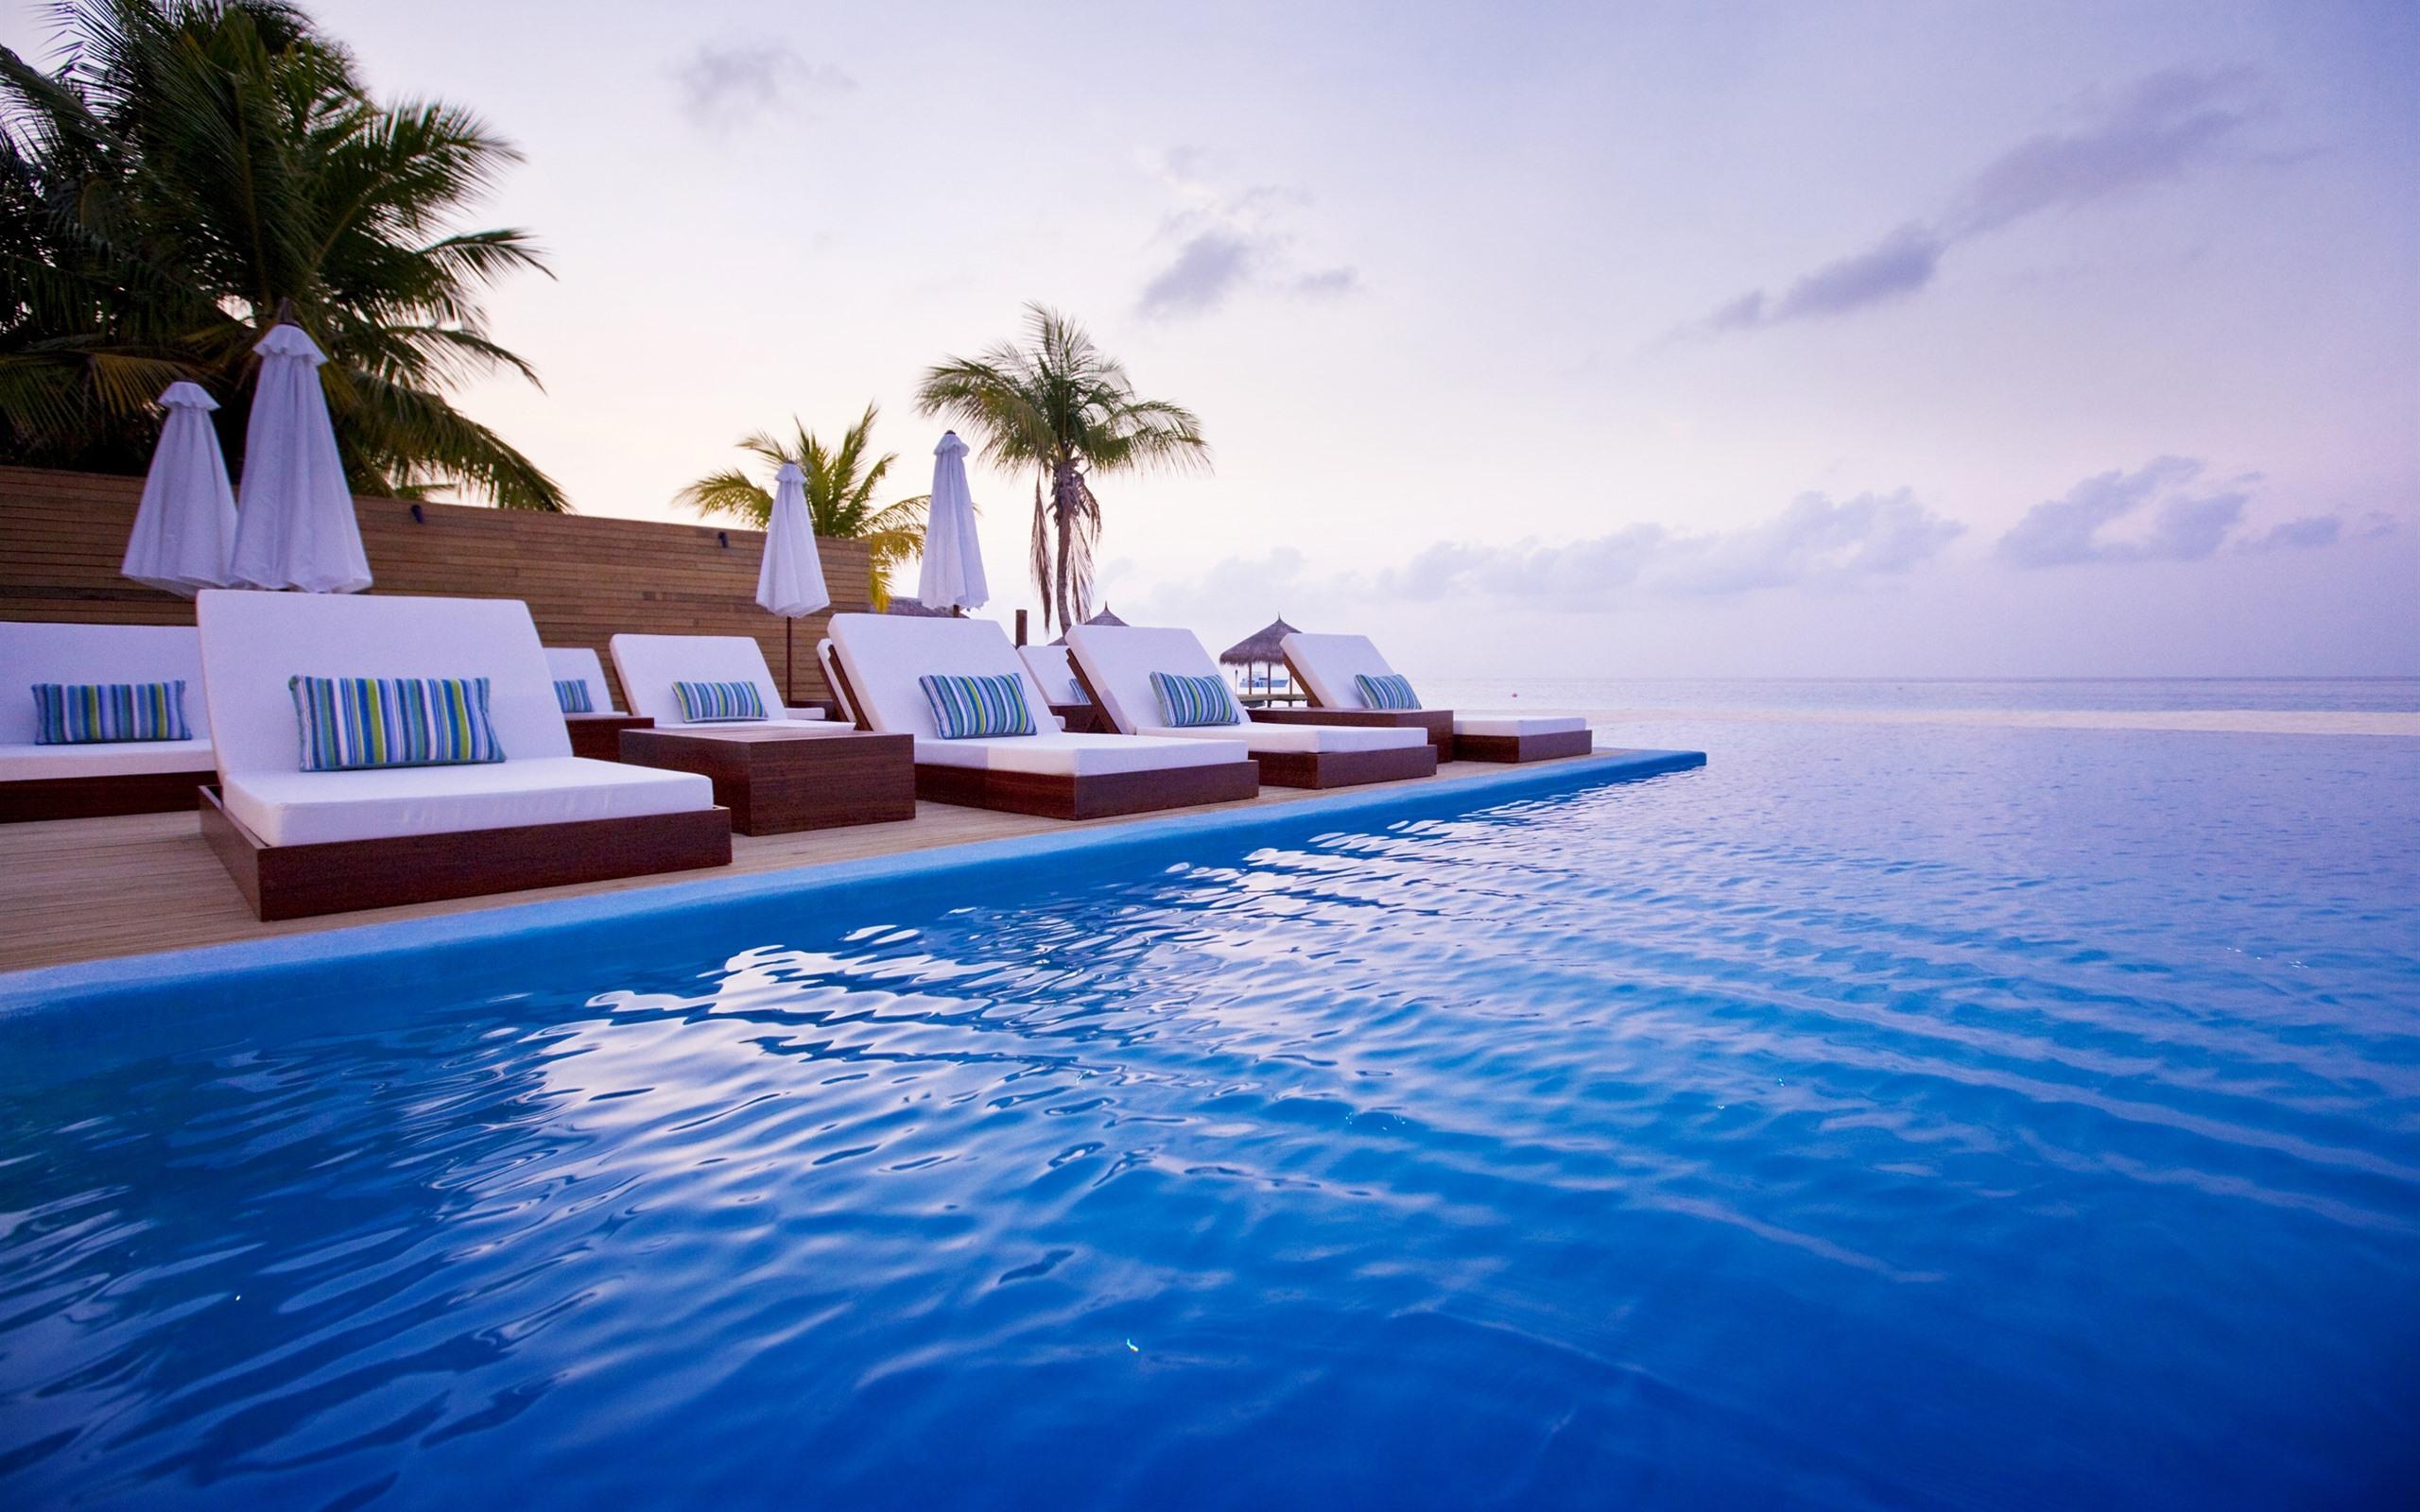 Wallpaper Umbrella Upside Down Floating Hd Creative: Wallpaper Maldives, Sun Lounger, Sea, Pool, Resort